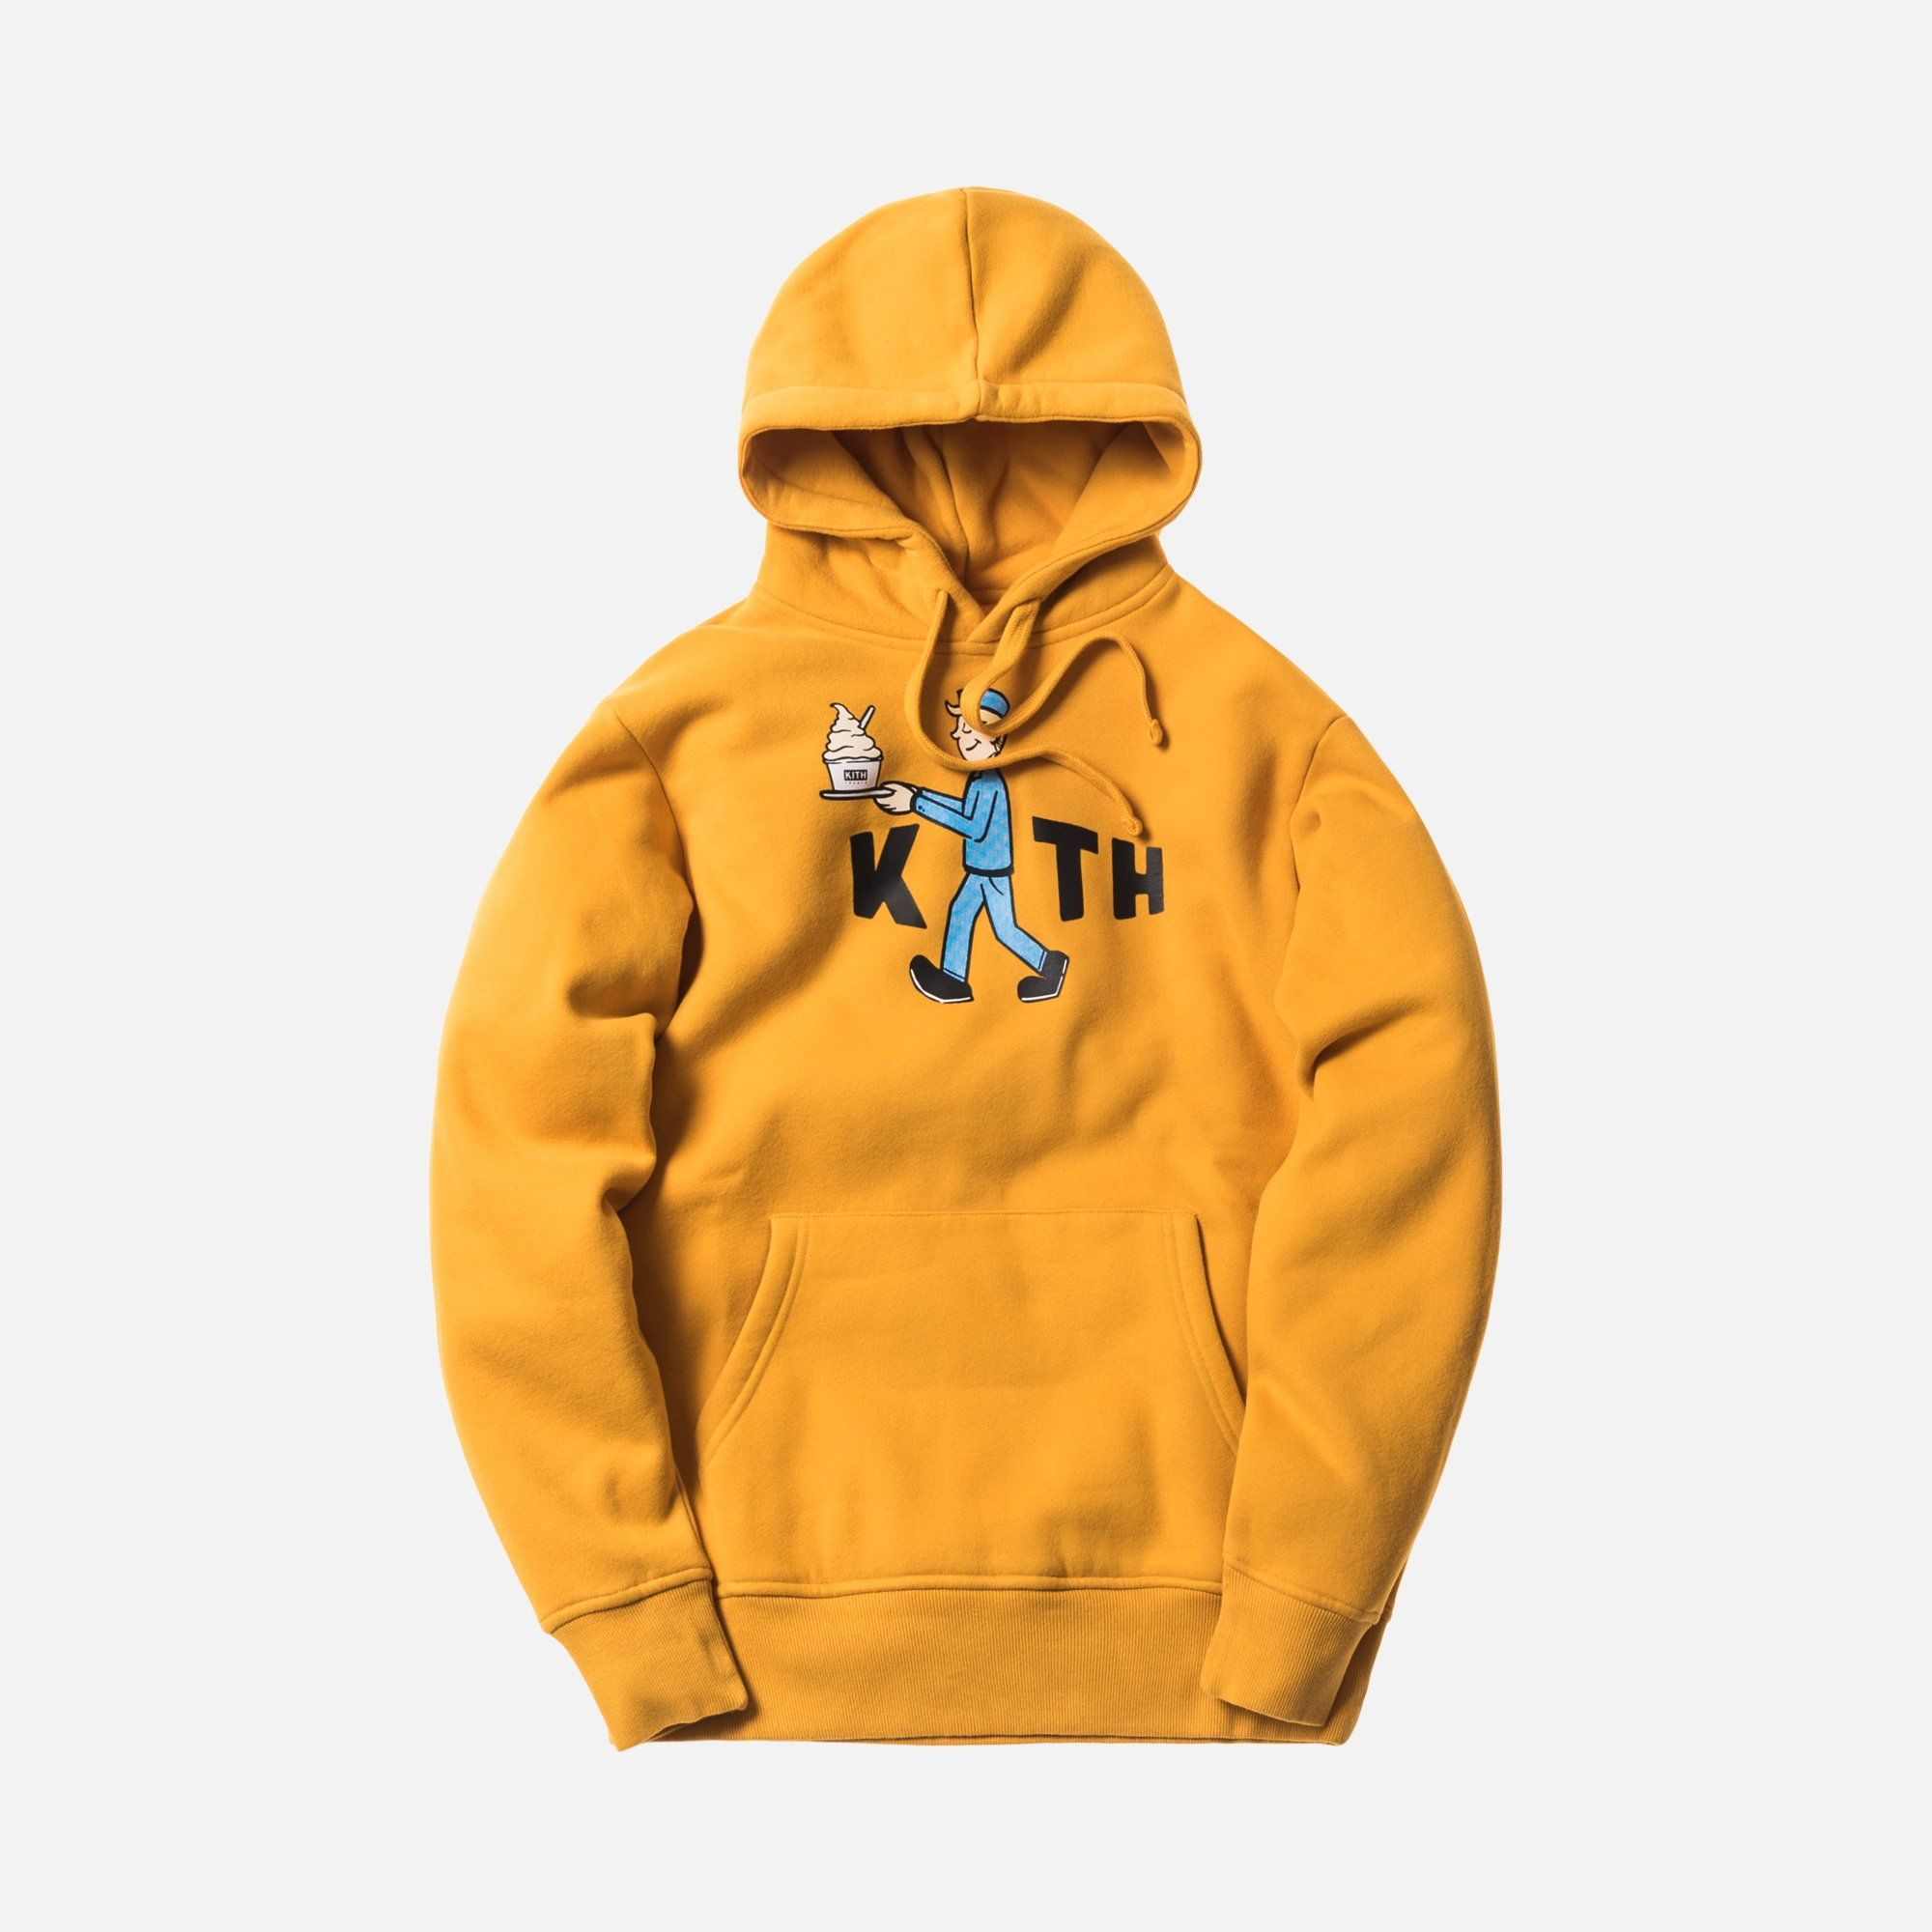 kith nike swoosh hoodie